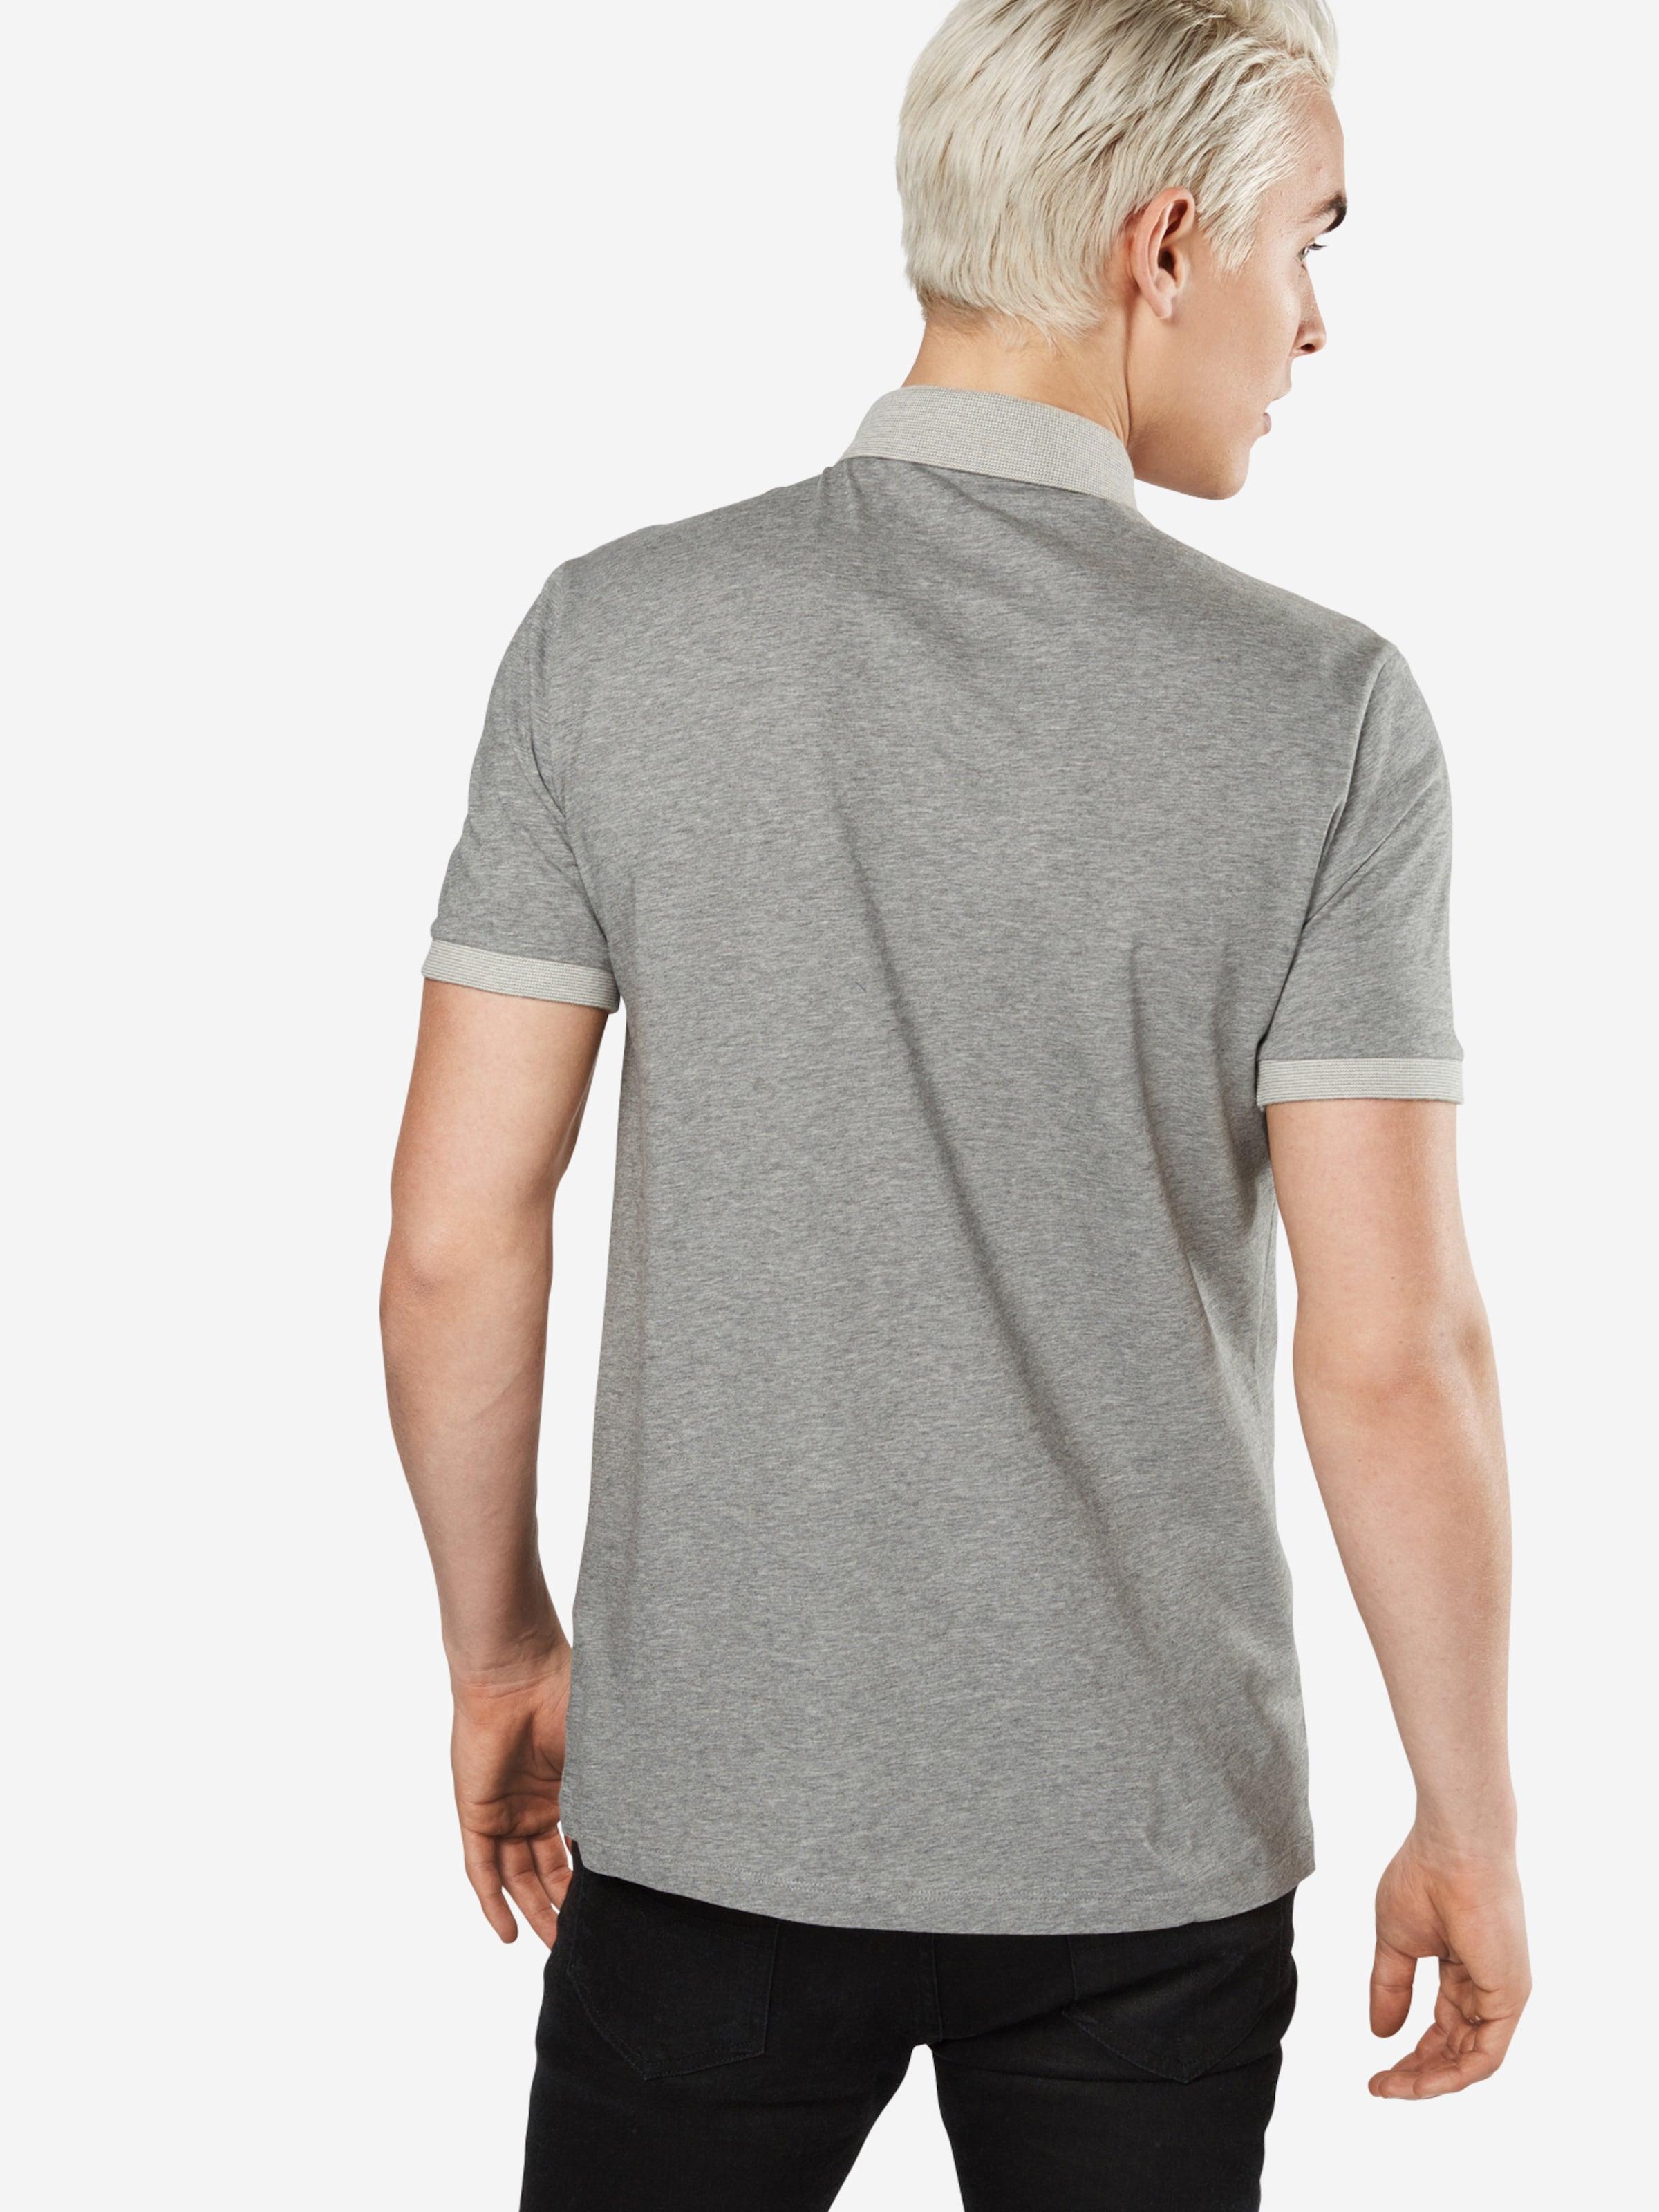 BOSS Poloshirt 'Pother' Mit Mastercard Zum Verkauf yPLmP3eM4